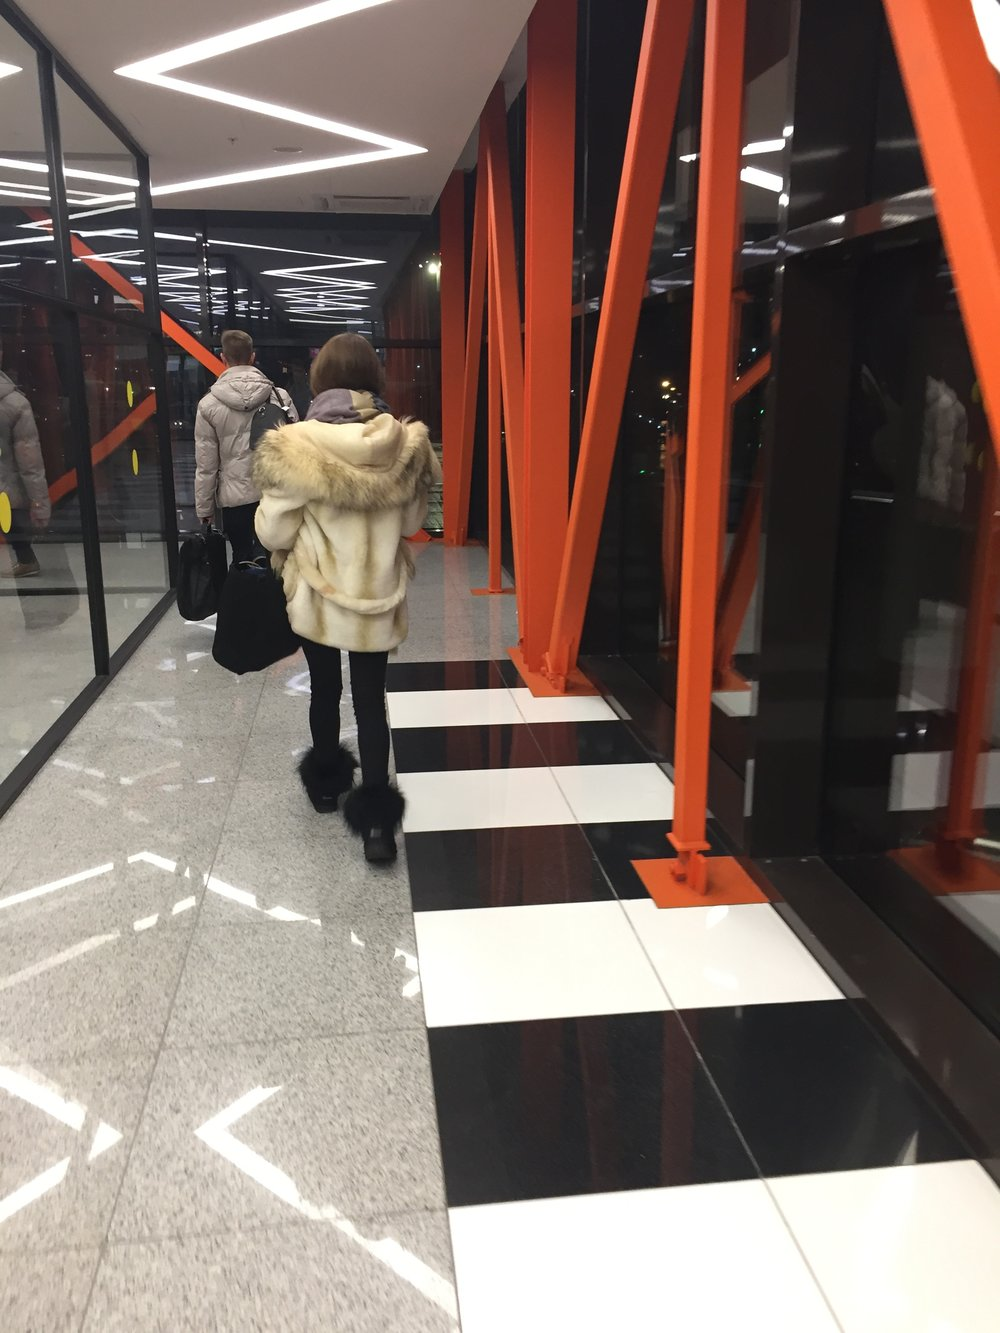 sheremetyevo airport boarding.JPG